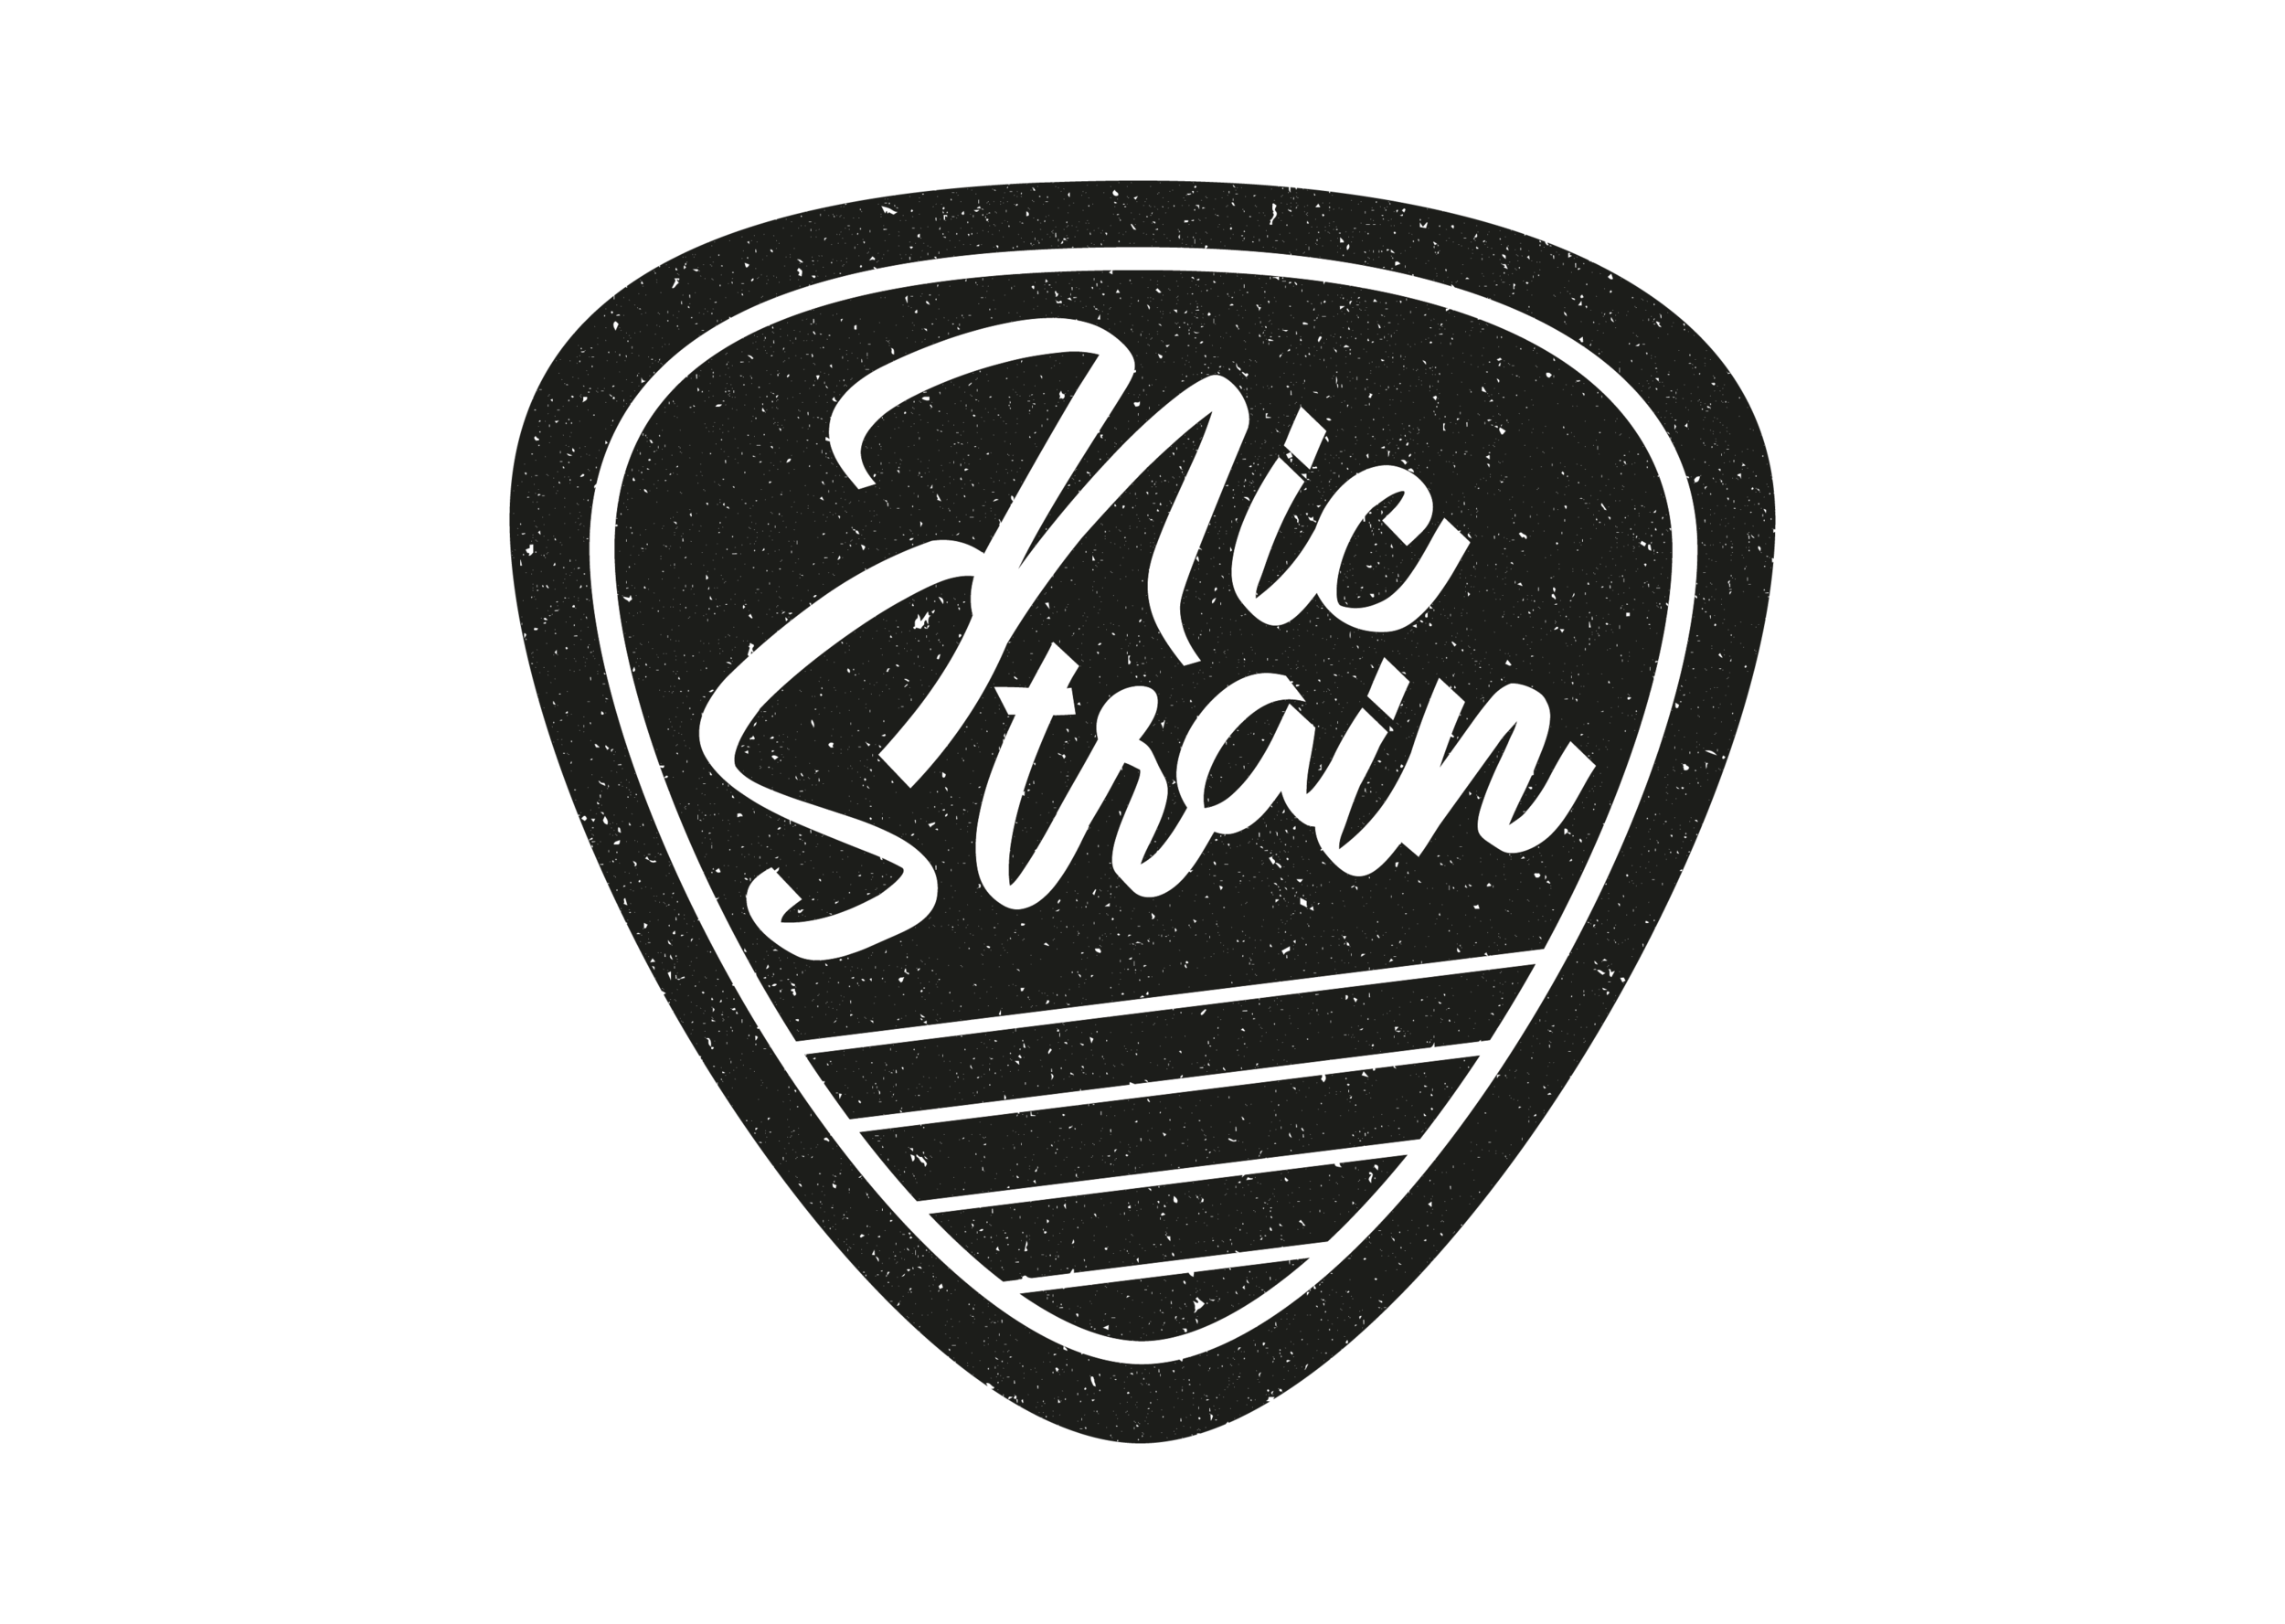 Nic-Strain-transparent-background.png